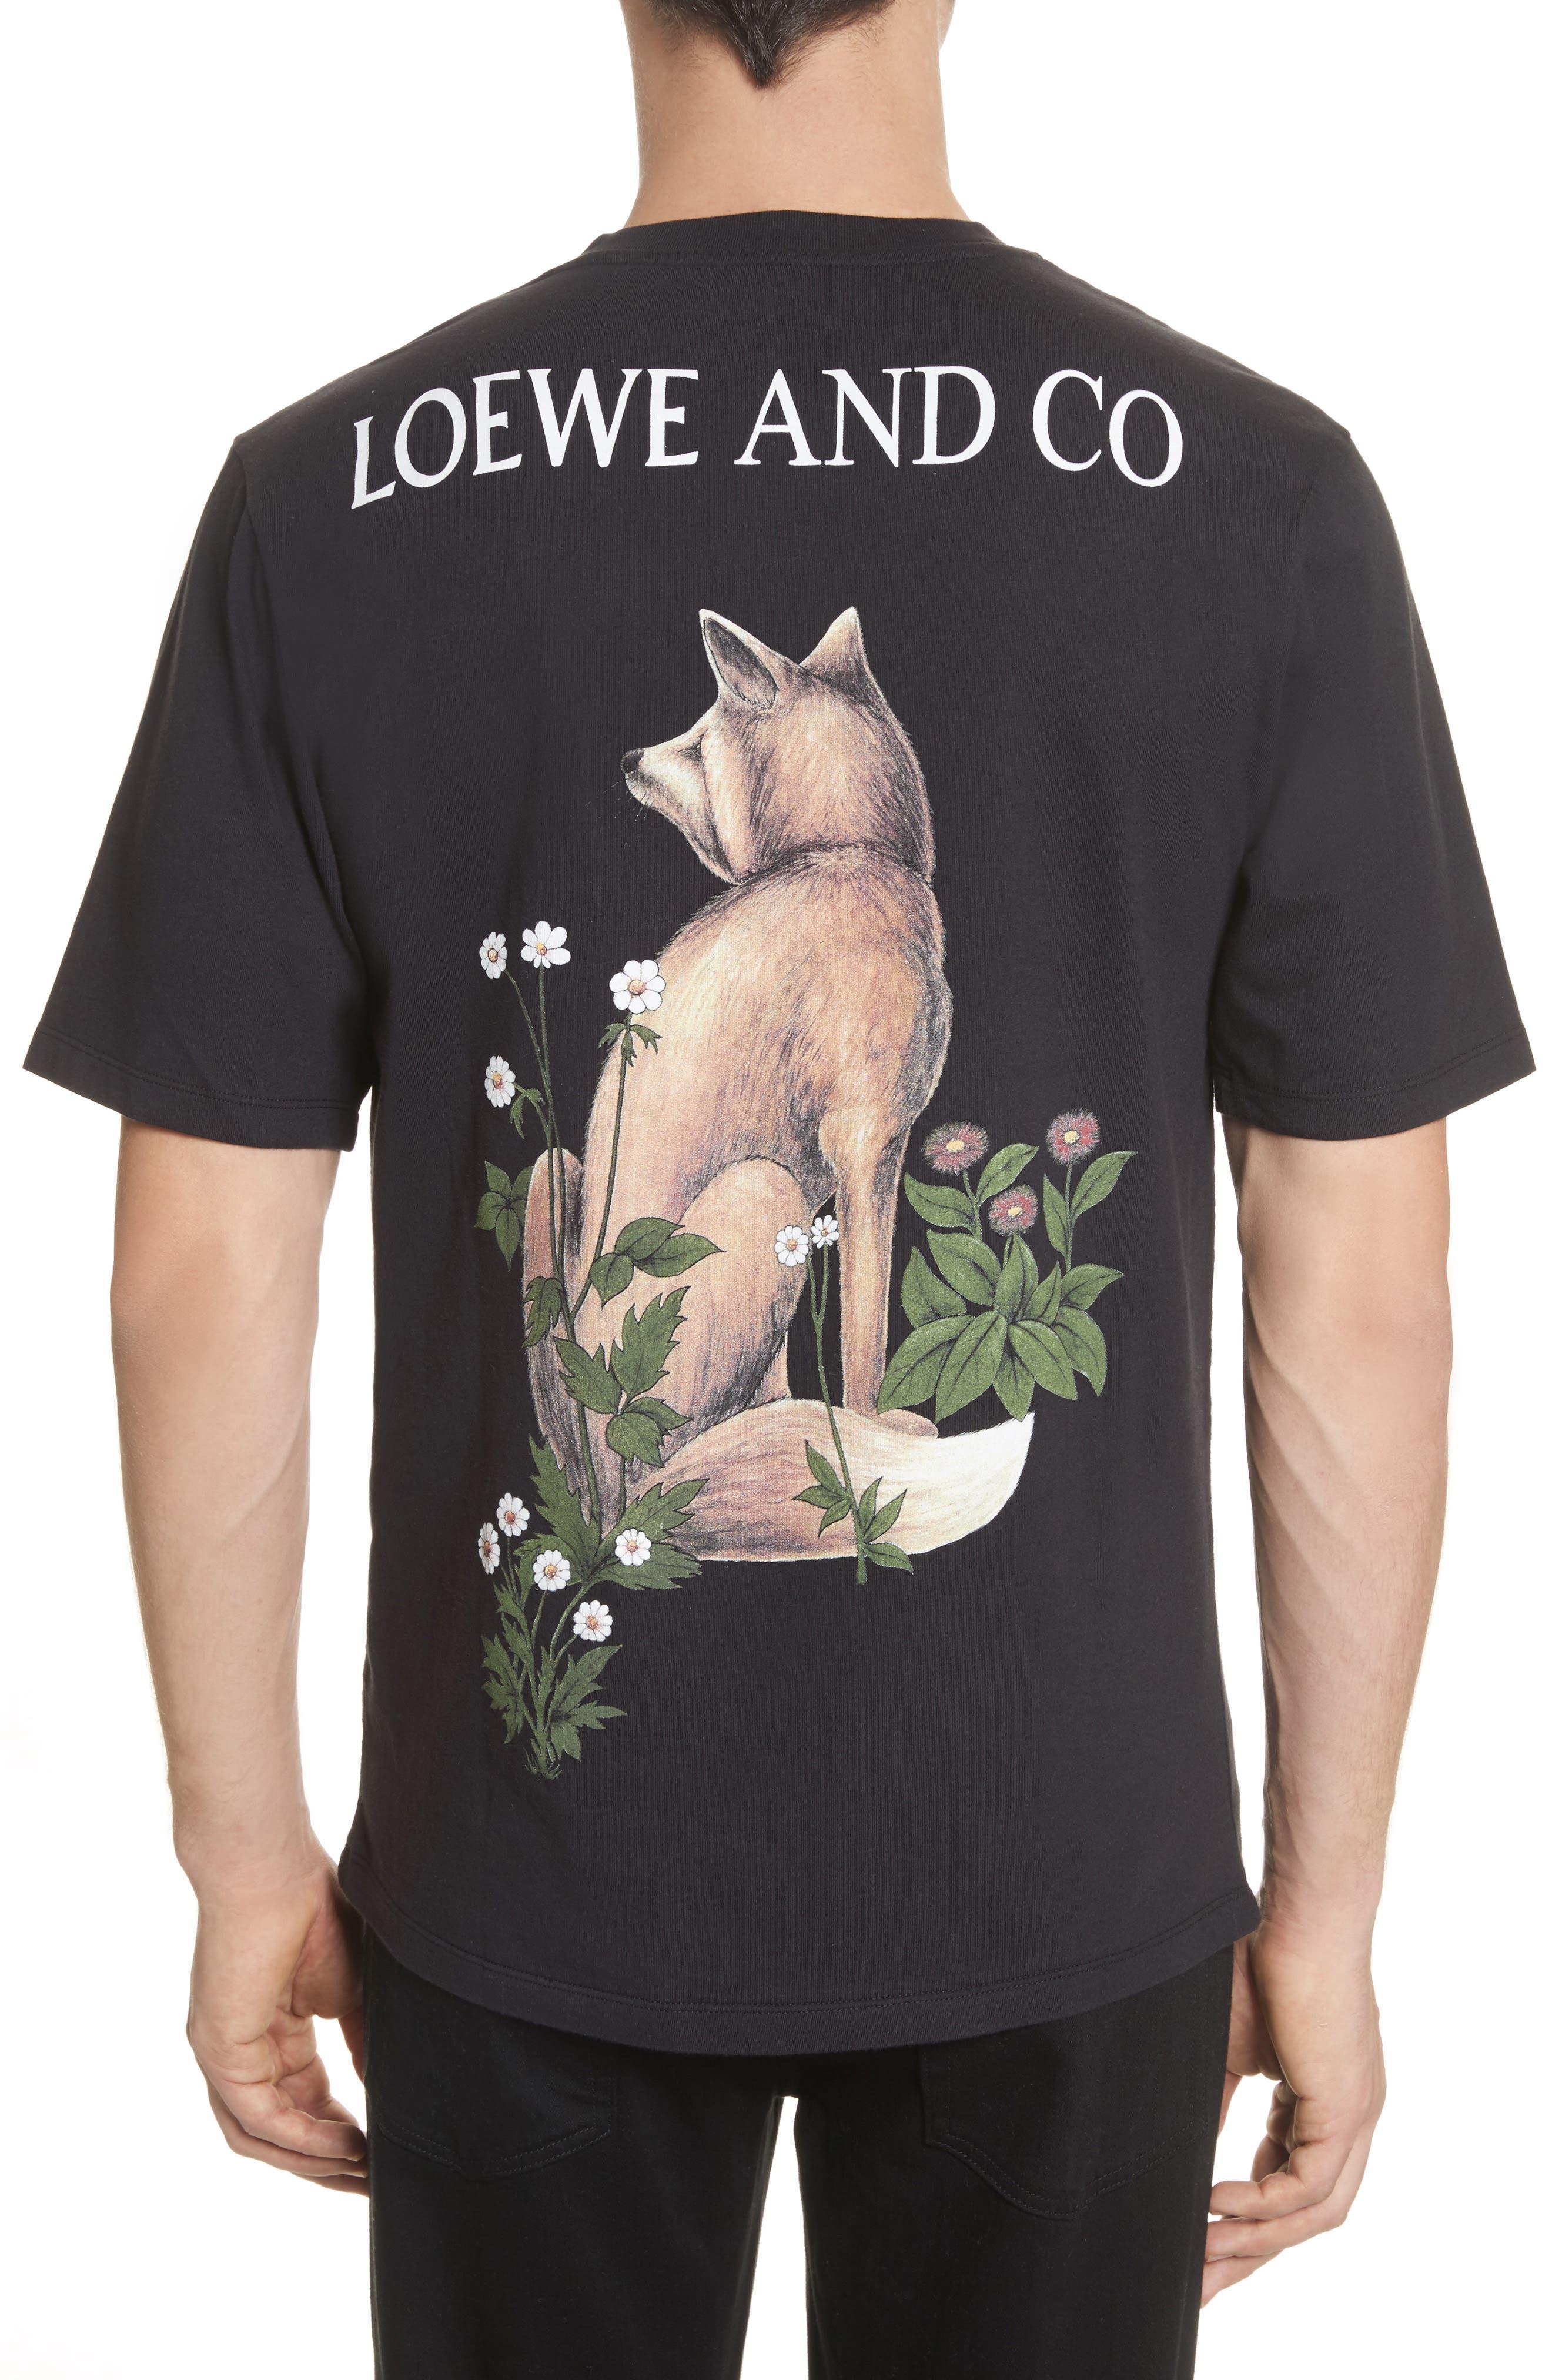 Loewe & Co. Graphic T-Shirt,                             Alternate thumbnail 2, color,                             001